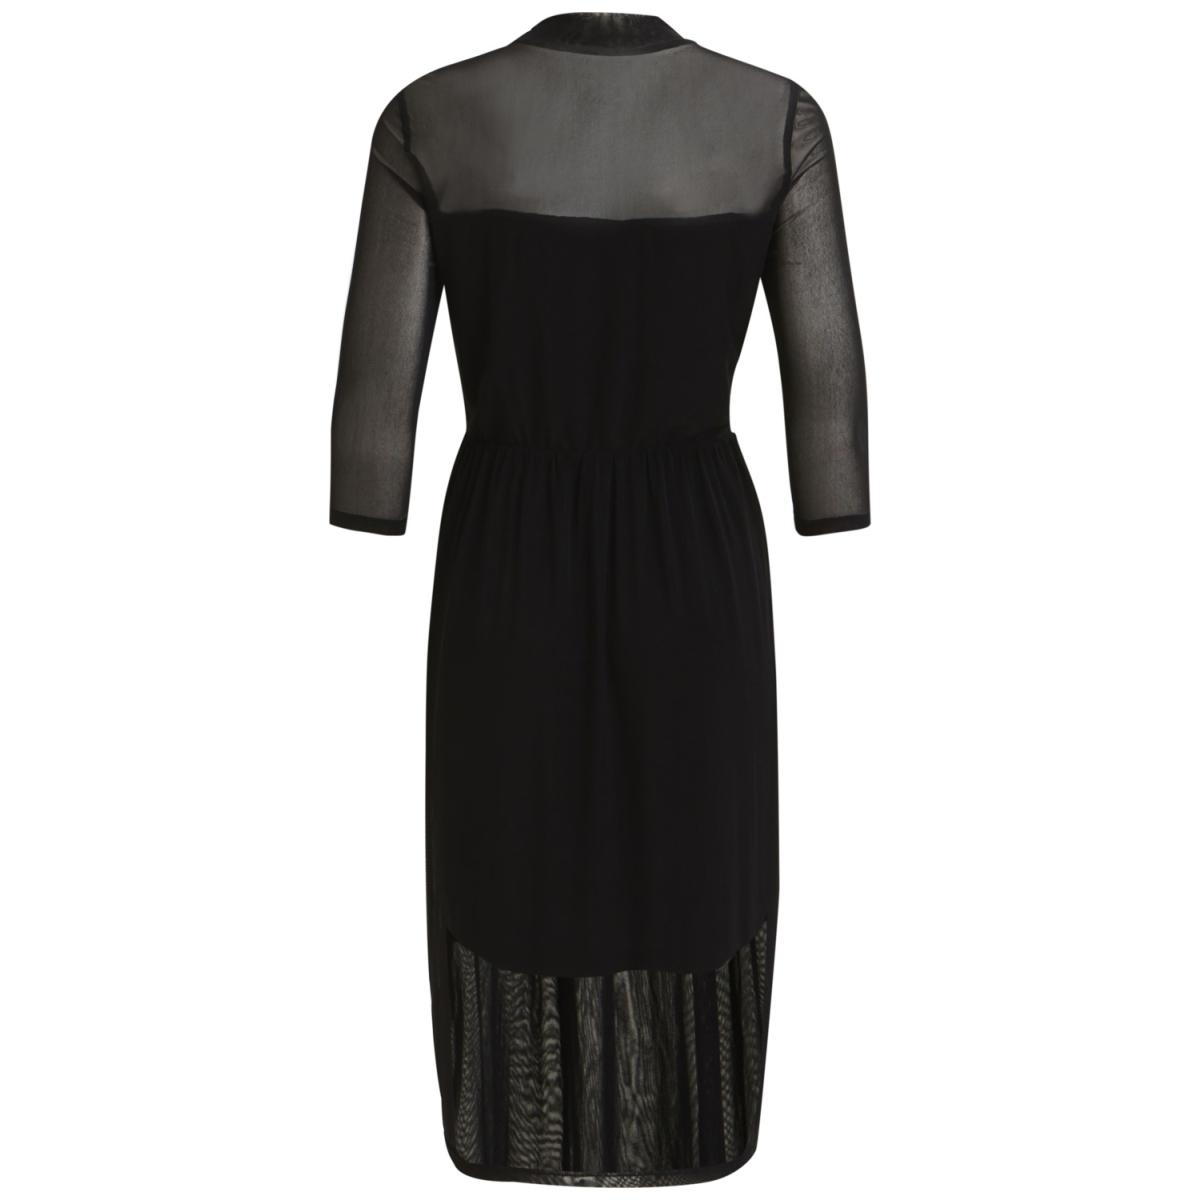 objczech l/s high neck midi dress a 23026097 object jurk black